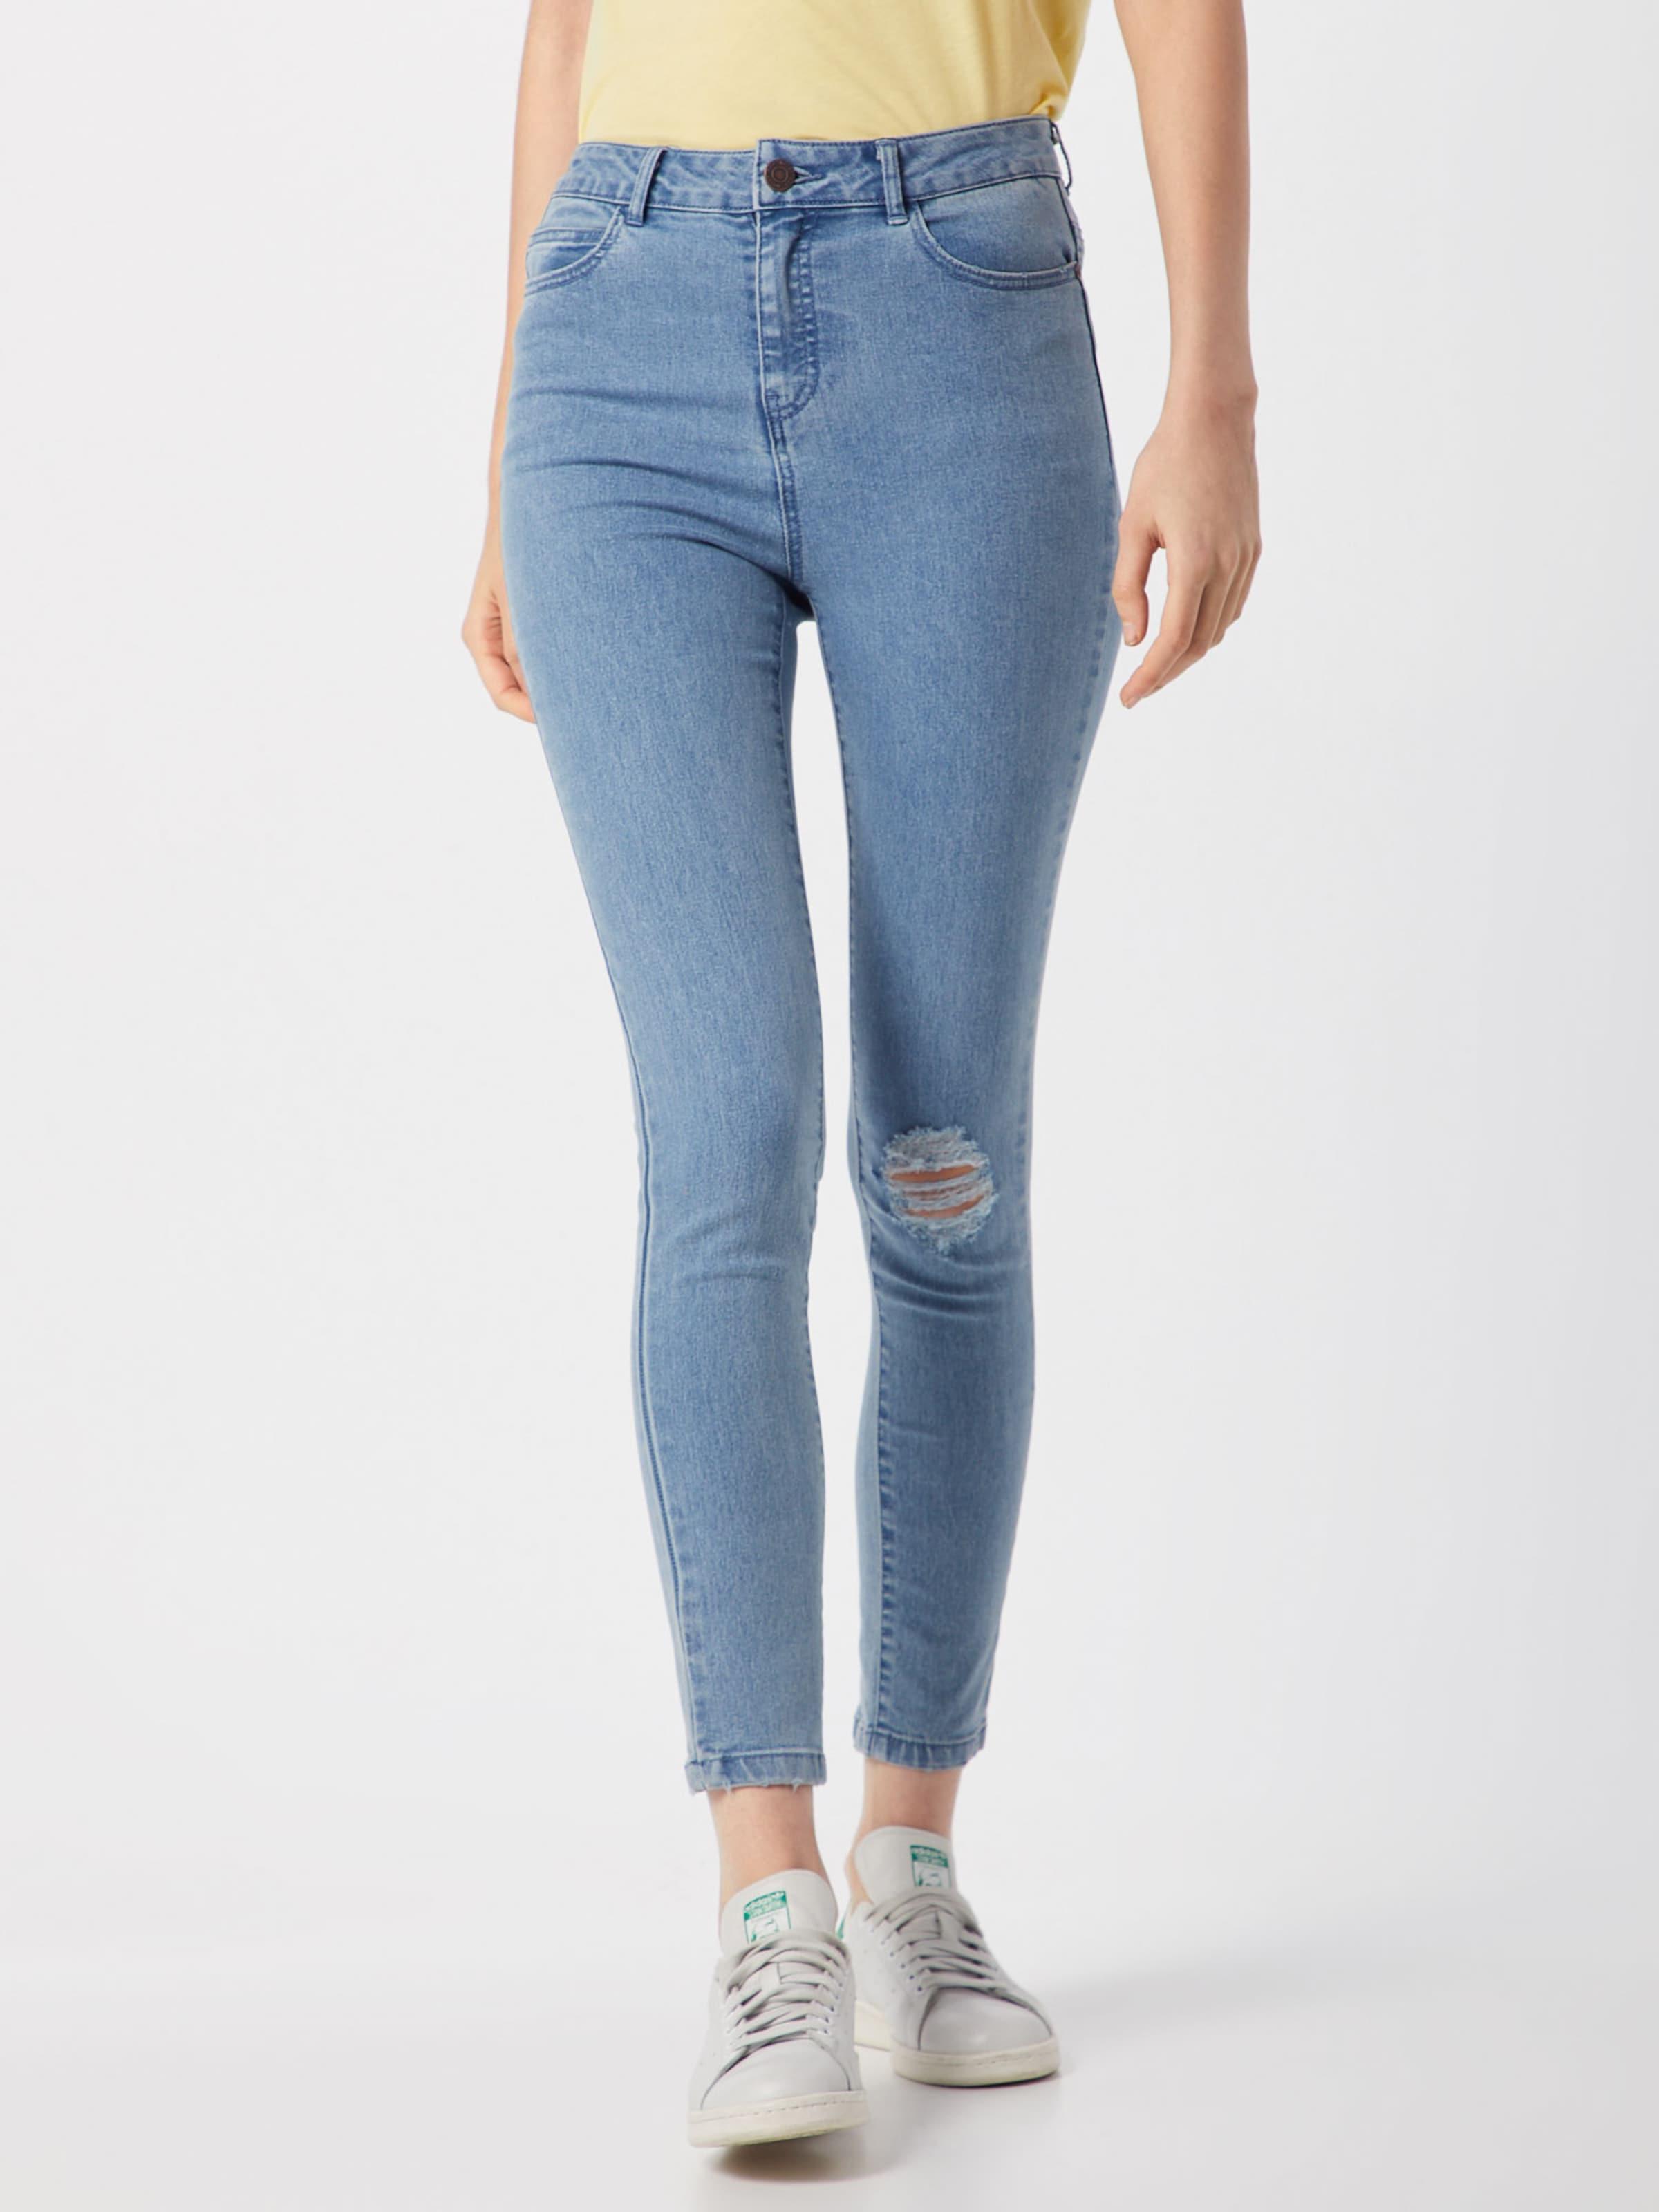 May Jeans 'lexi' In Blue Denim Noisy yv0wNOPnm8